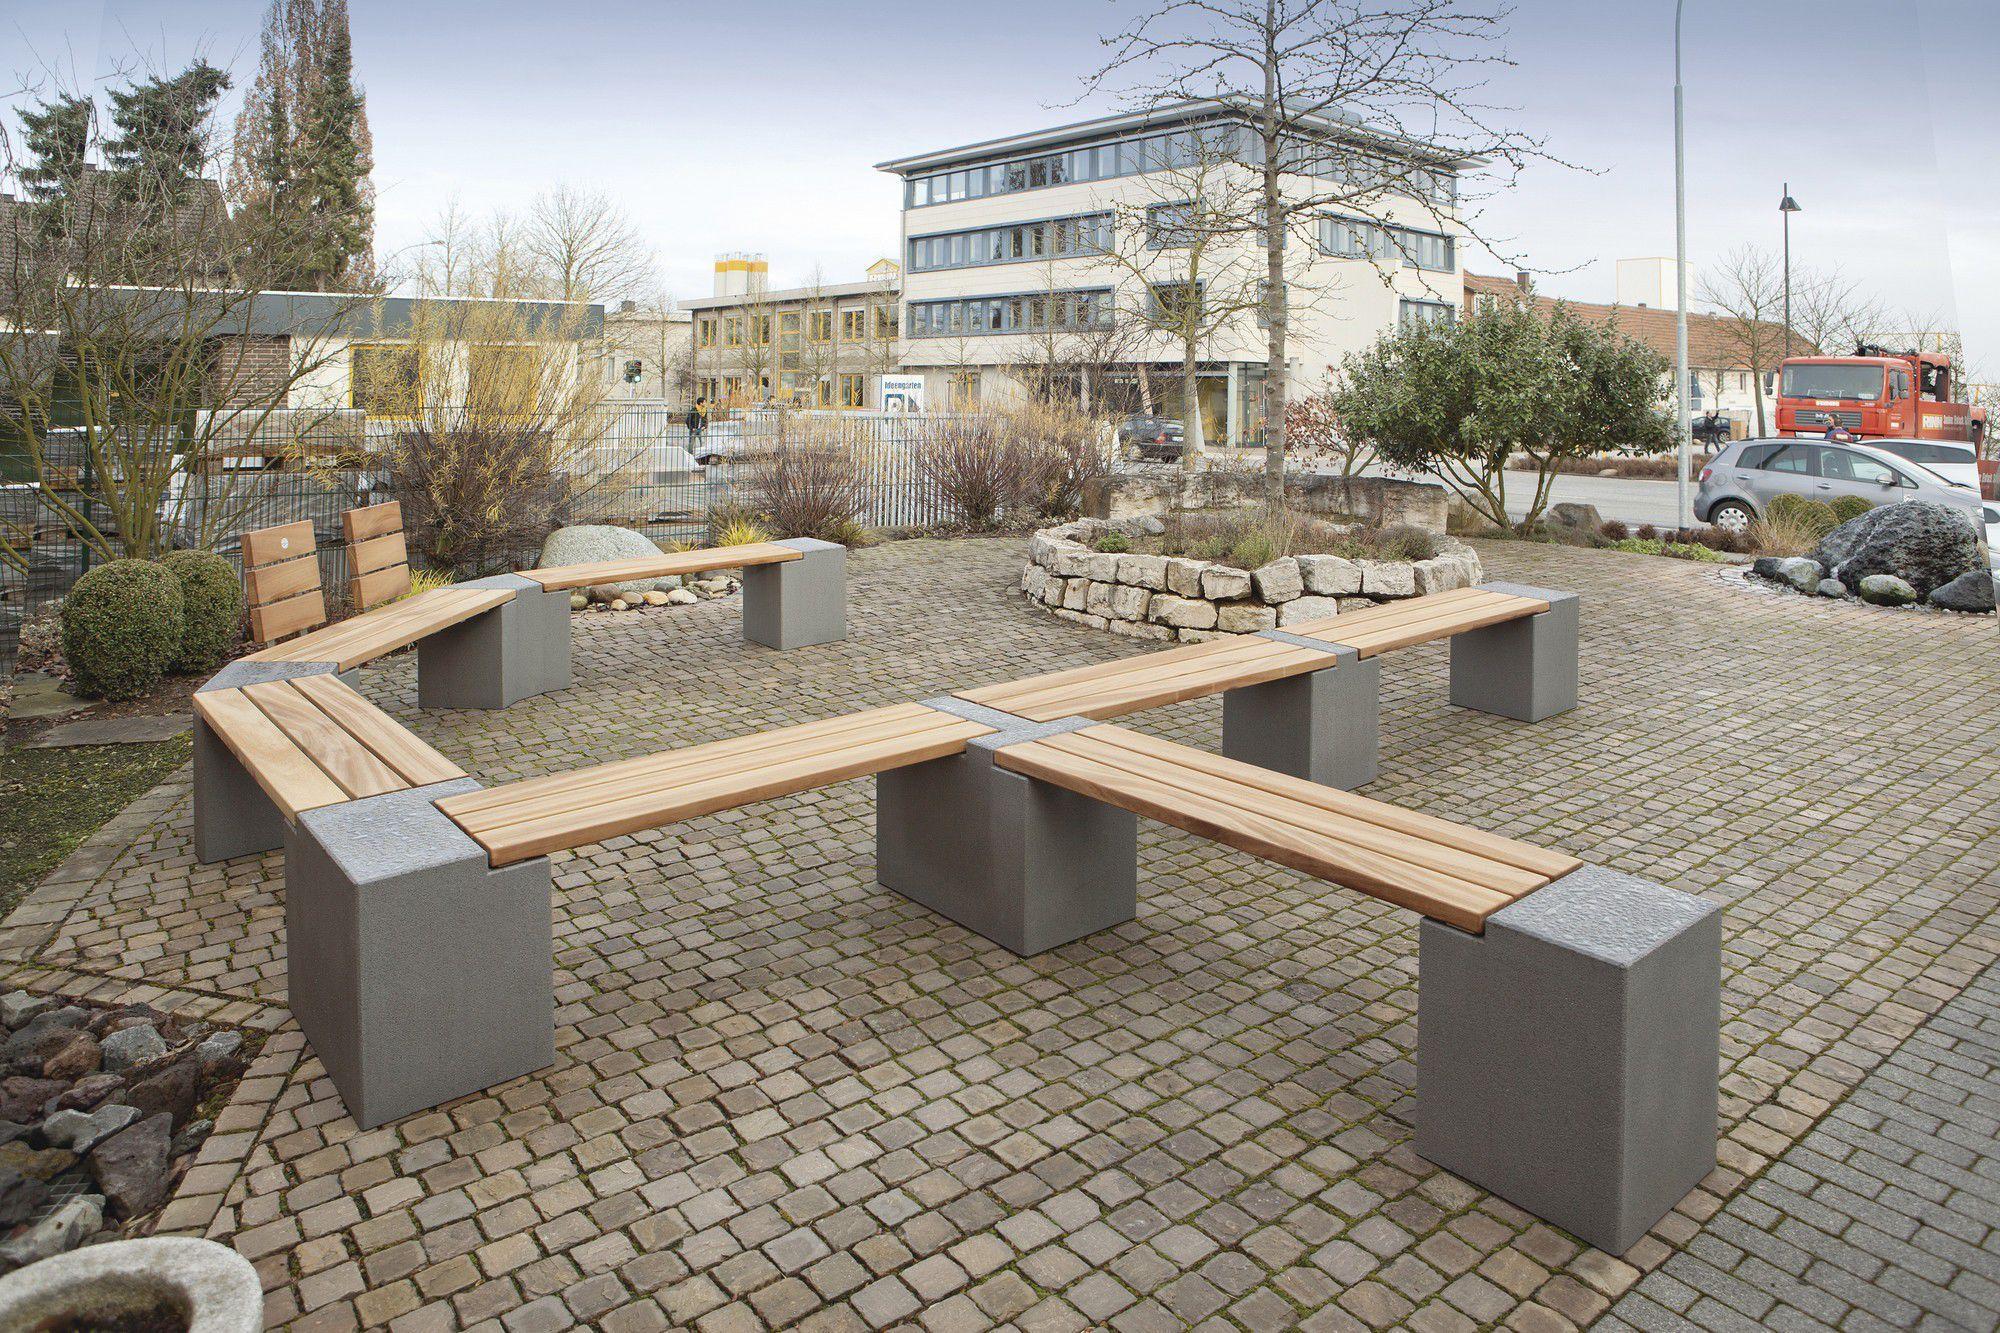 Gartenbank modern beton  Gartenbank Modern Holz Und Stein – igelscout.info